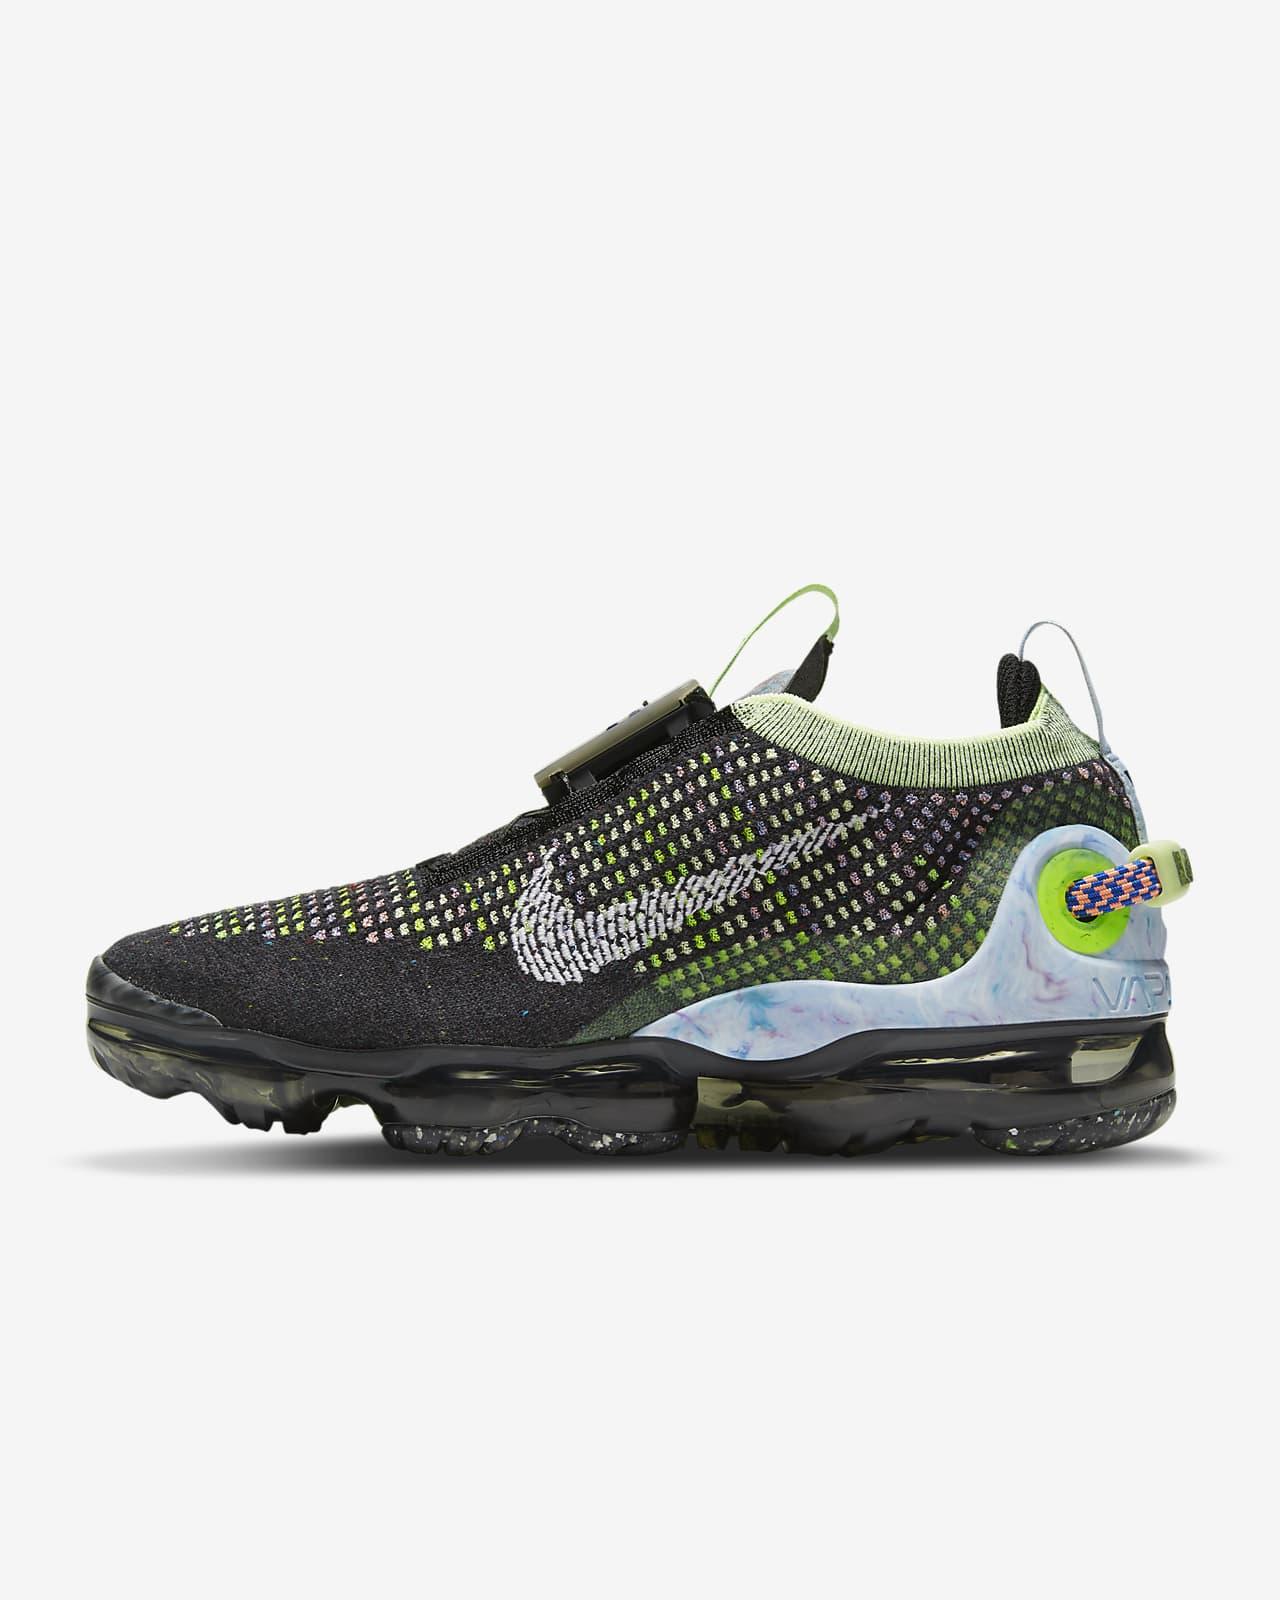 Nike Air Vapormax 2020 Flyknit-sko til kvinder